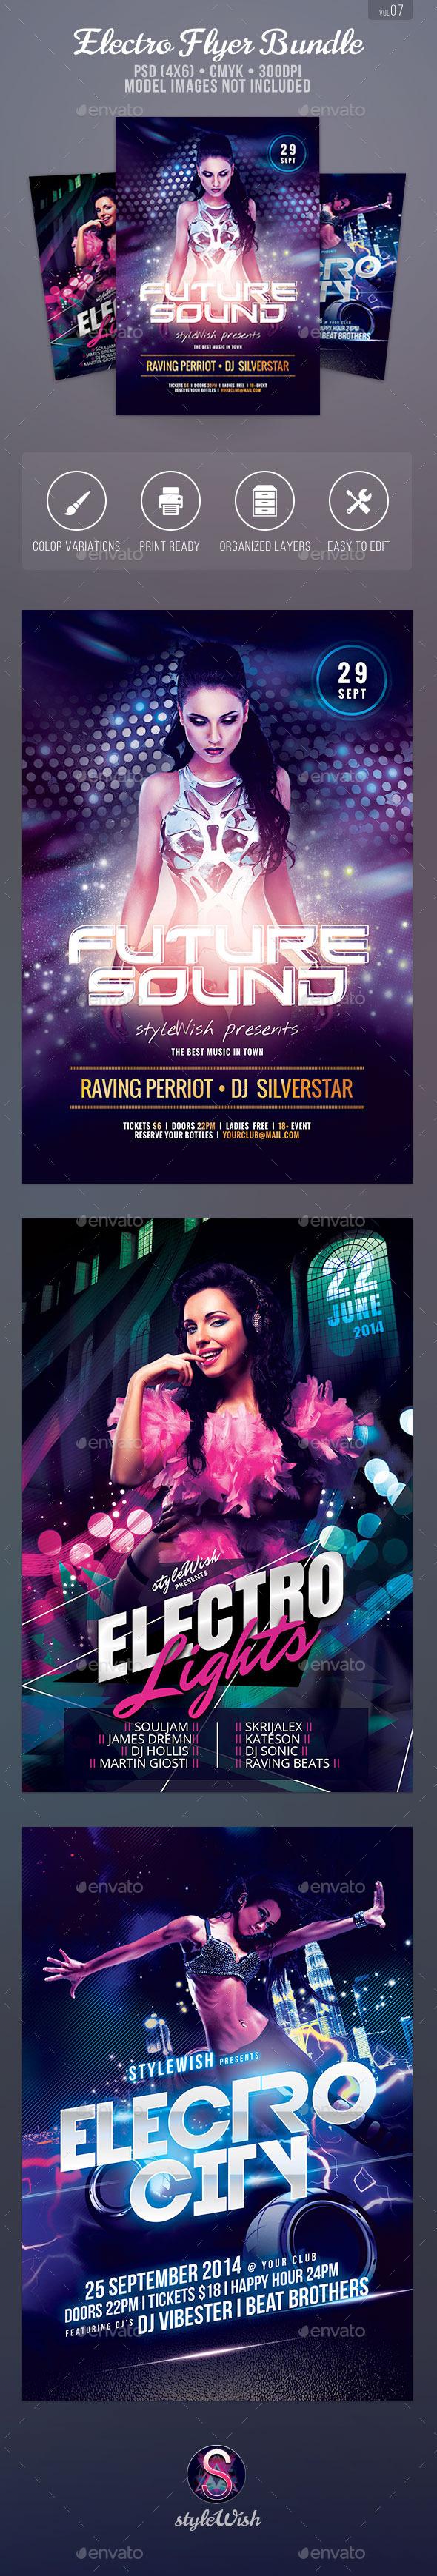 Electro Party Flyer Bundle Vol.07 - Clubs & Parties Events